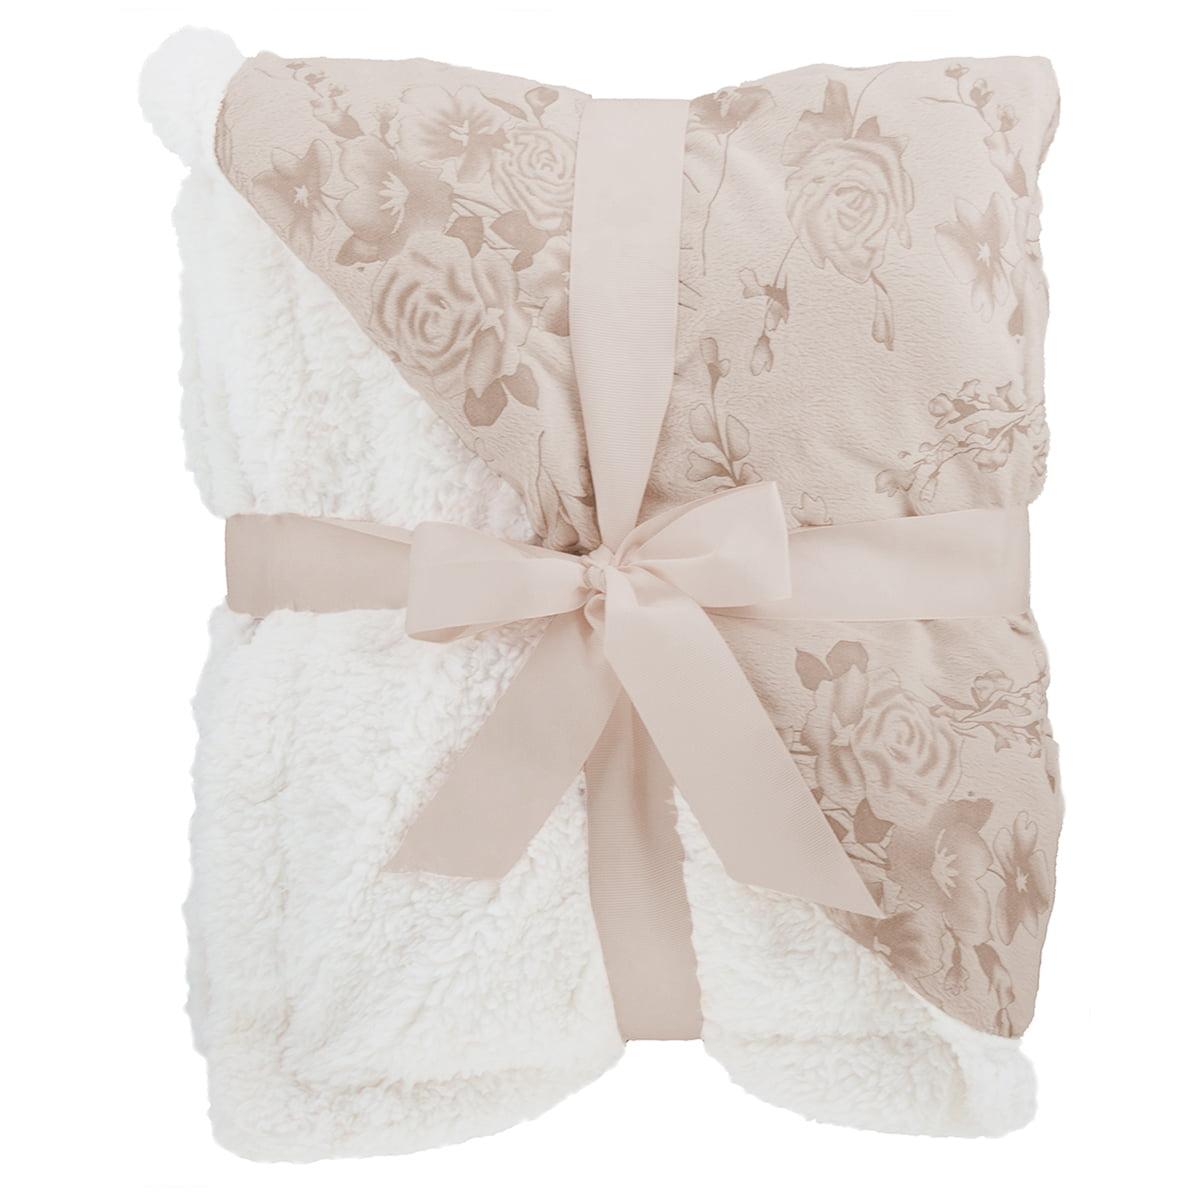 "Sherpa Throw Blanket 50"" x 60"" Plush Fleece Reversible Floral ..."